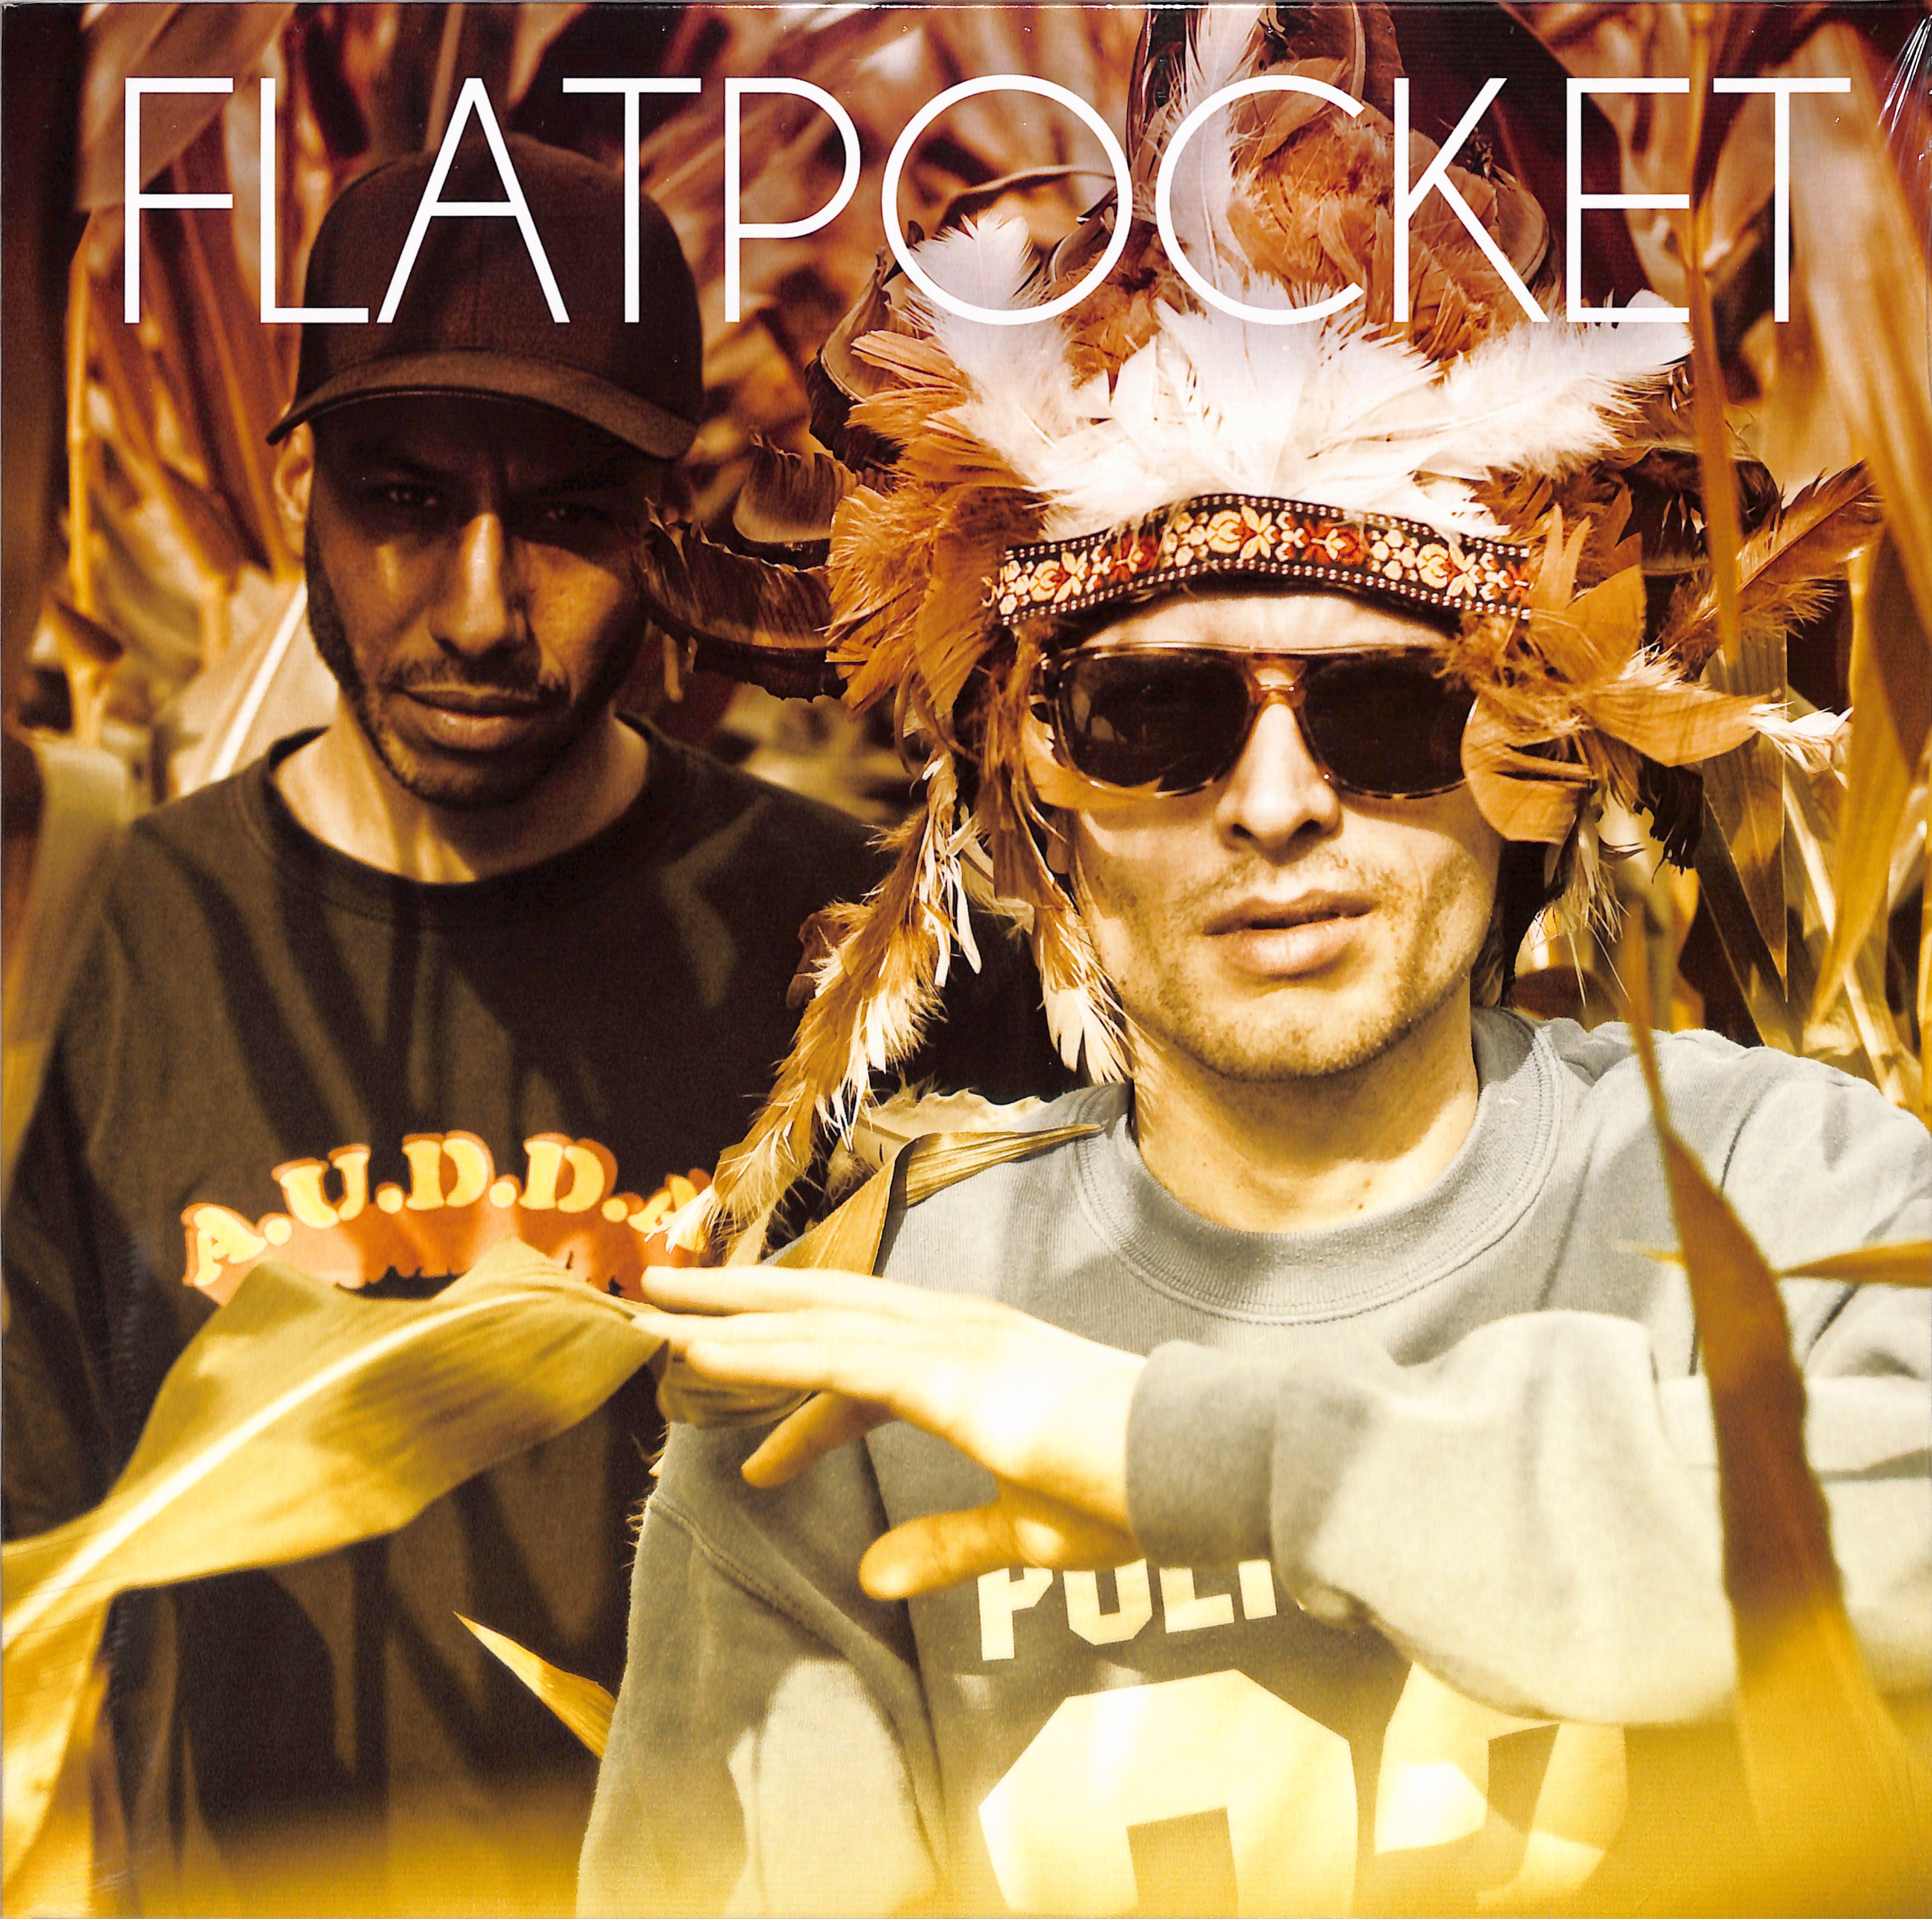 Flatpocket - GELDPFUNDPHANTASYEN